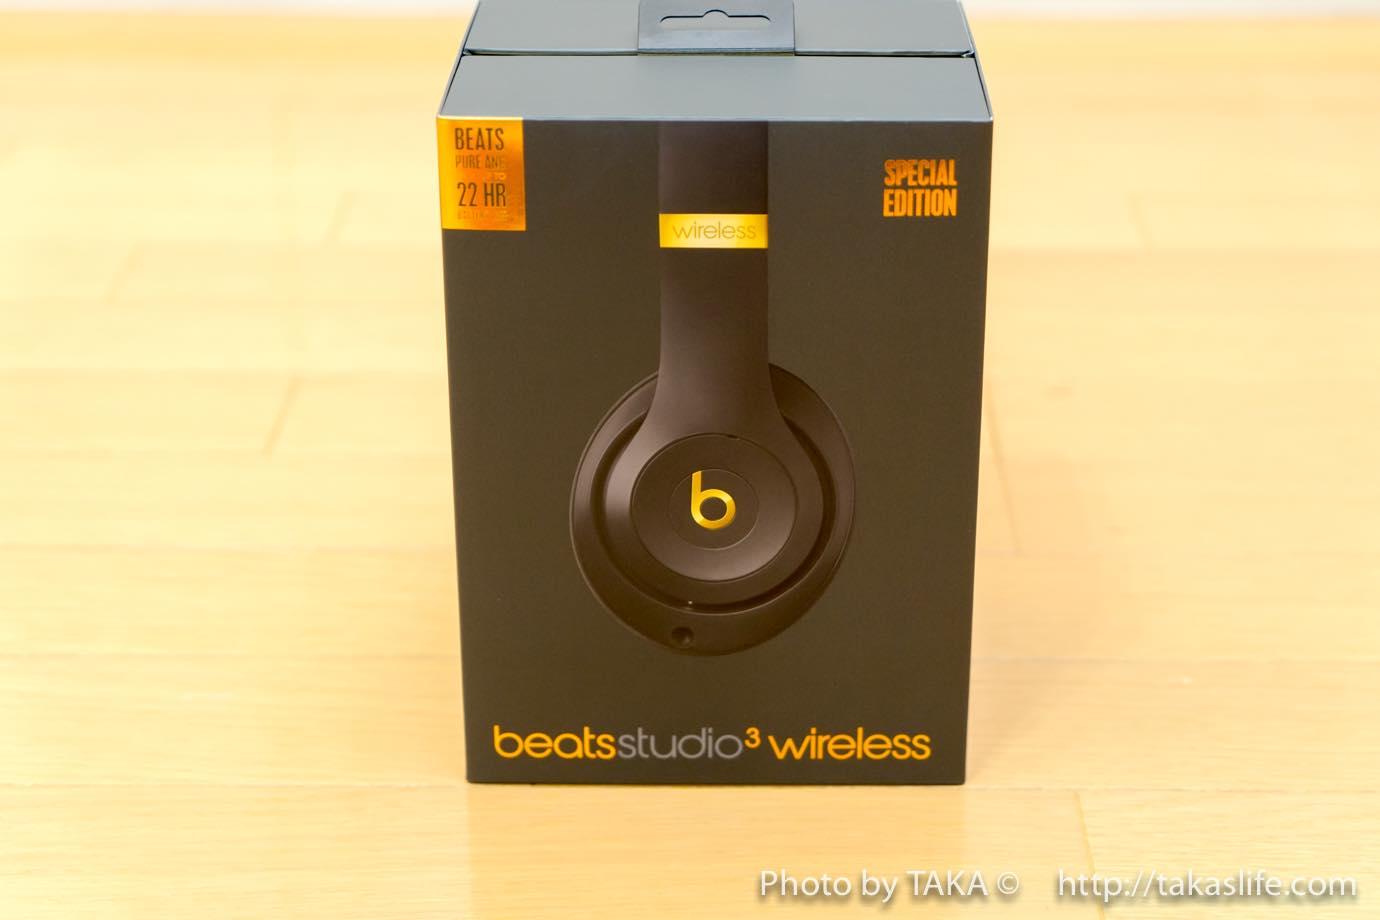 Beats Studio3 Wirelessオーバーイヤーヘッドフォン 03 20171029 141812